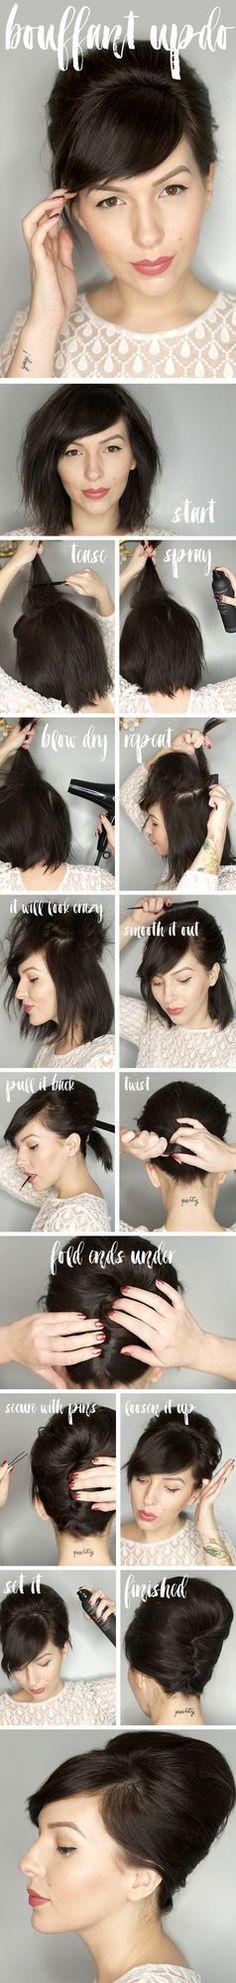 Bouffant Updo Hair Tutorial   keiko lynn   Bloglovin'